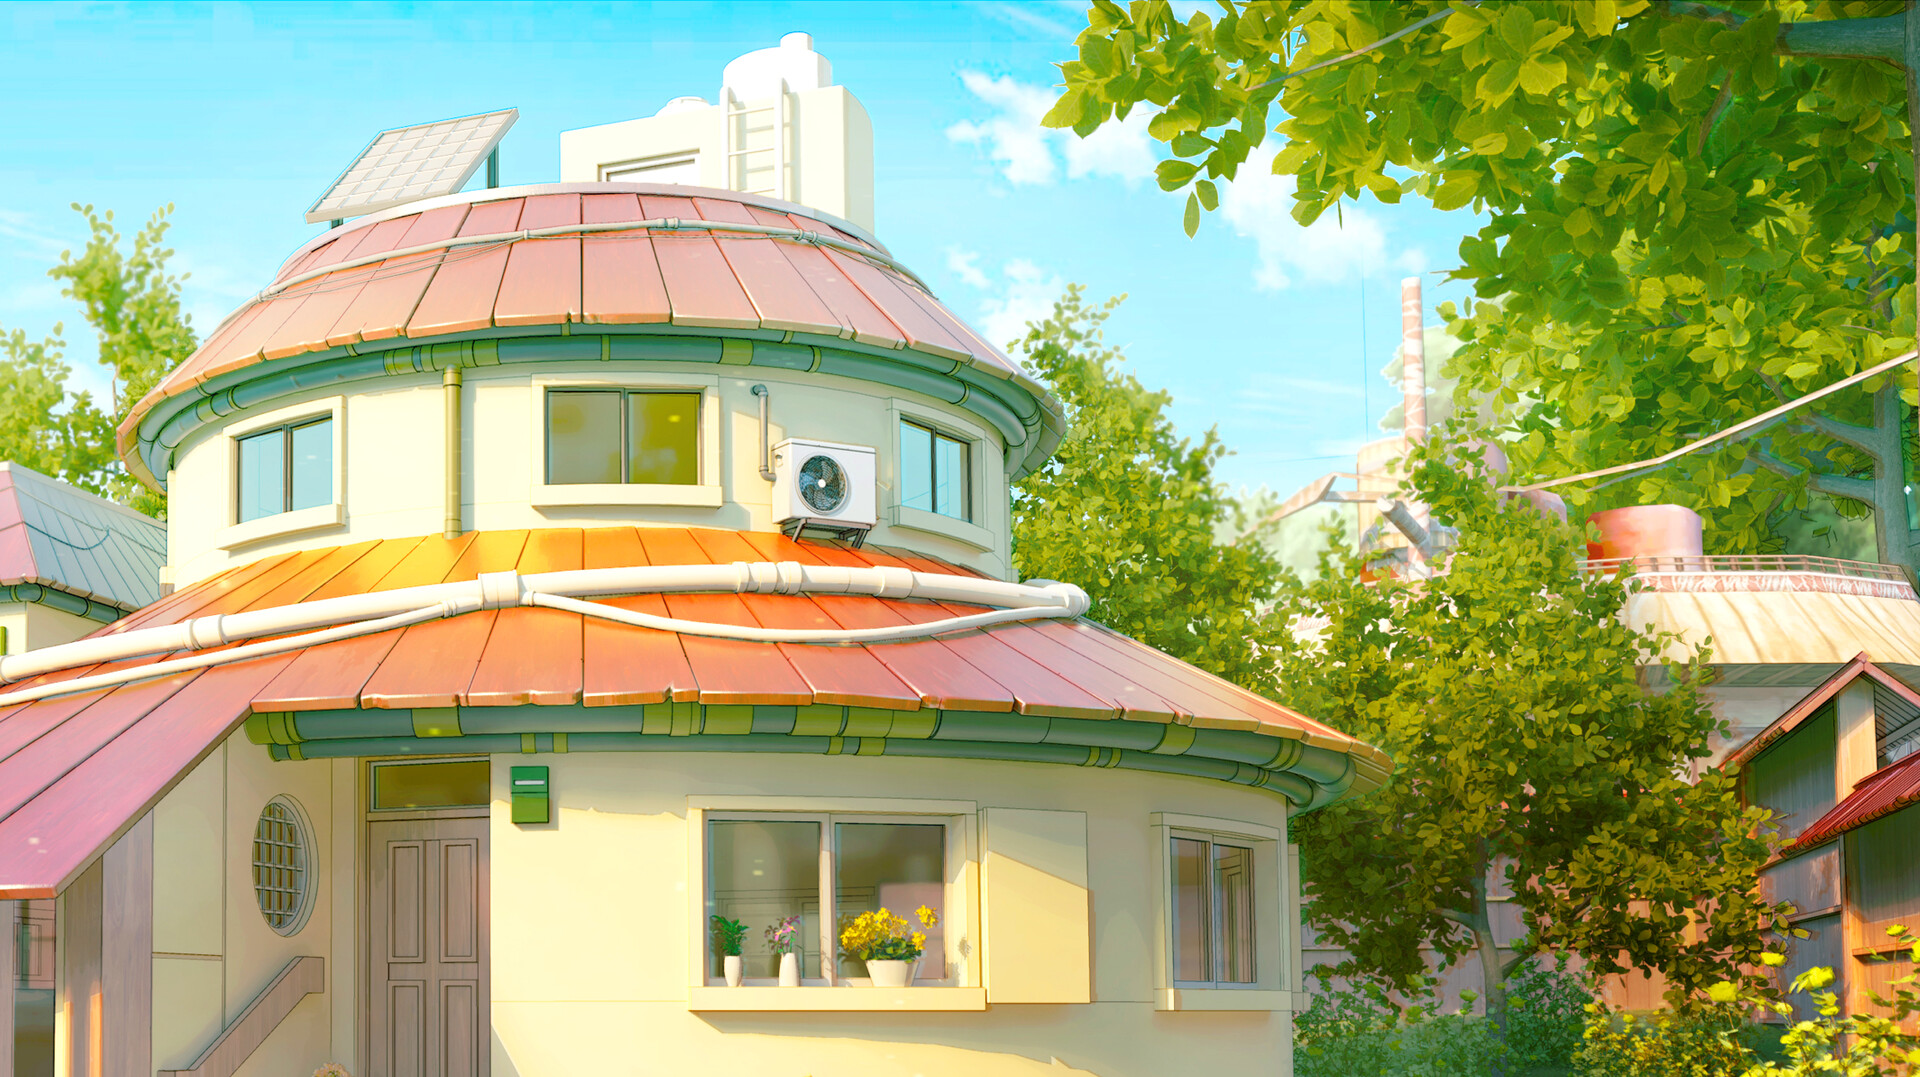 doseieva kuca Omorphia-visual-naruto-house-2